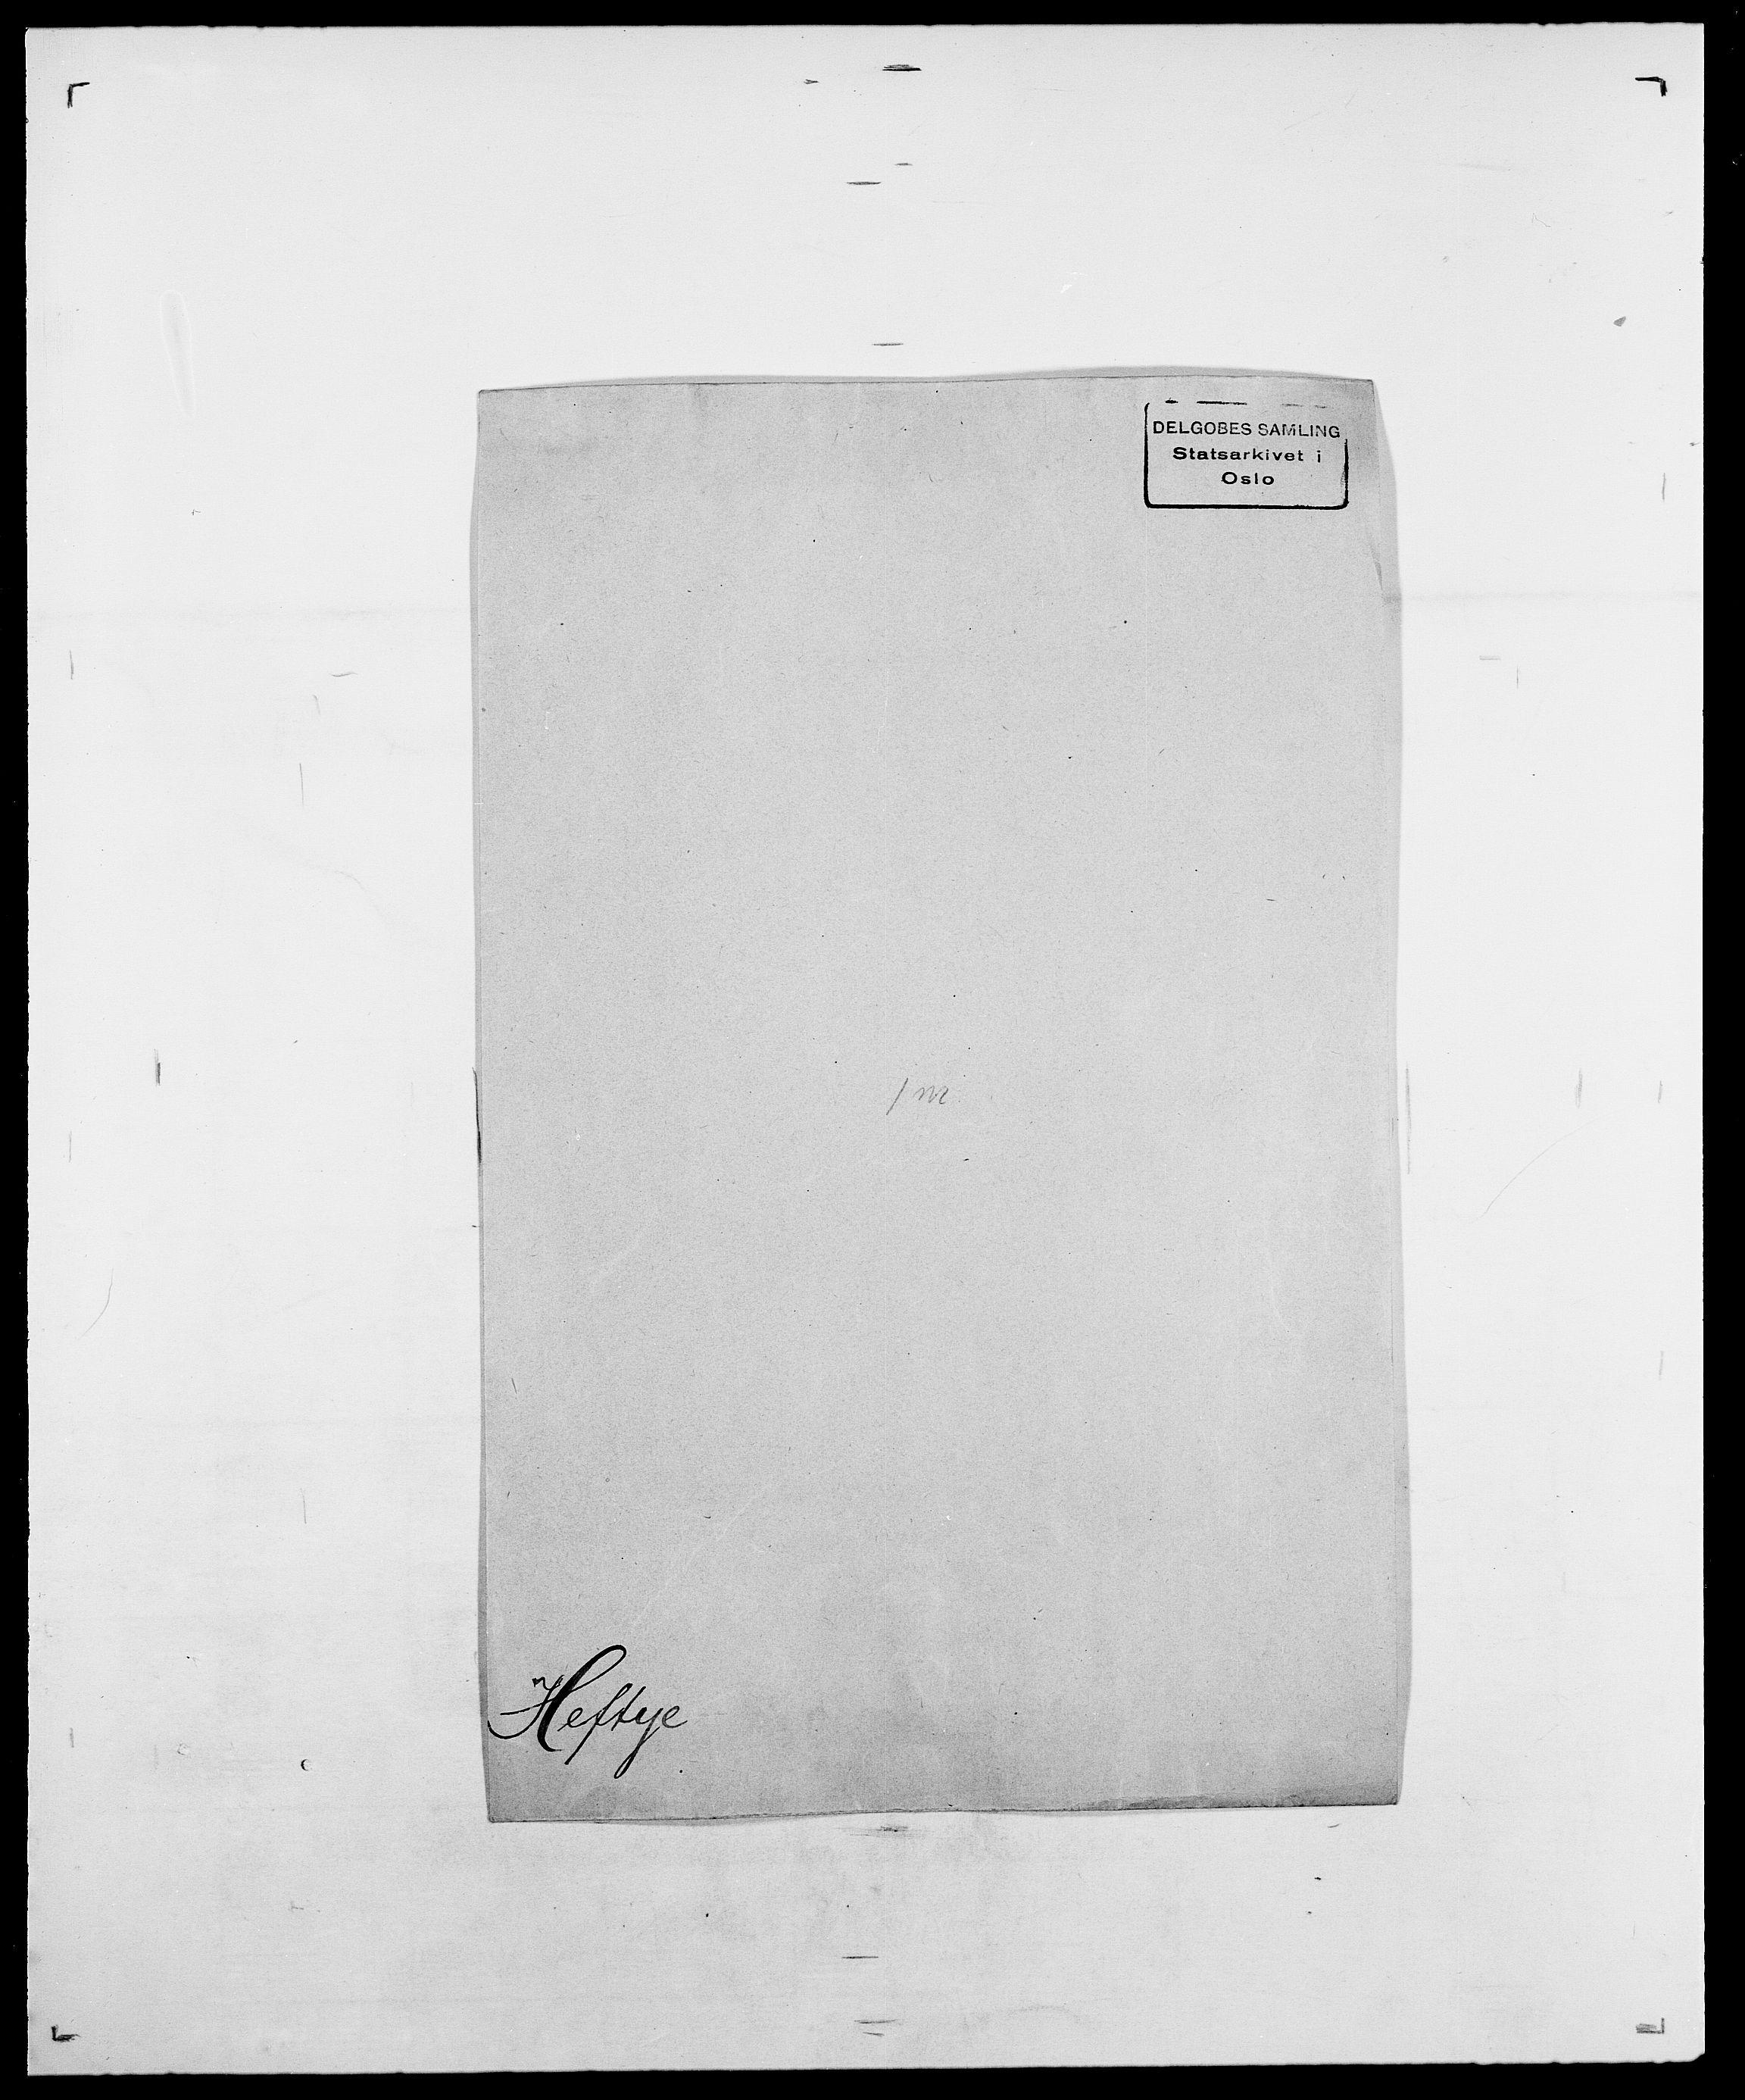 SAO, Delgobe, Charles Antoine - samling, D/Da/L0016: Hamborg - Hektoen, s. 709